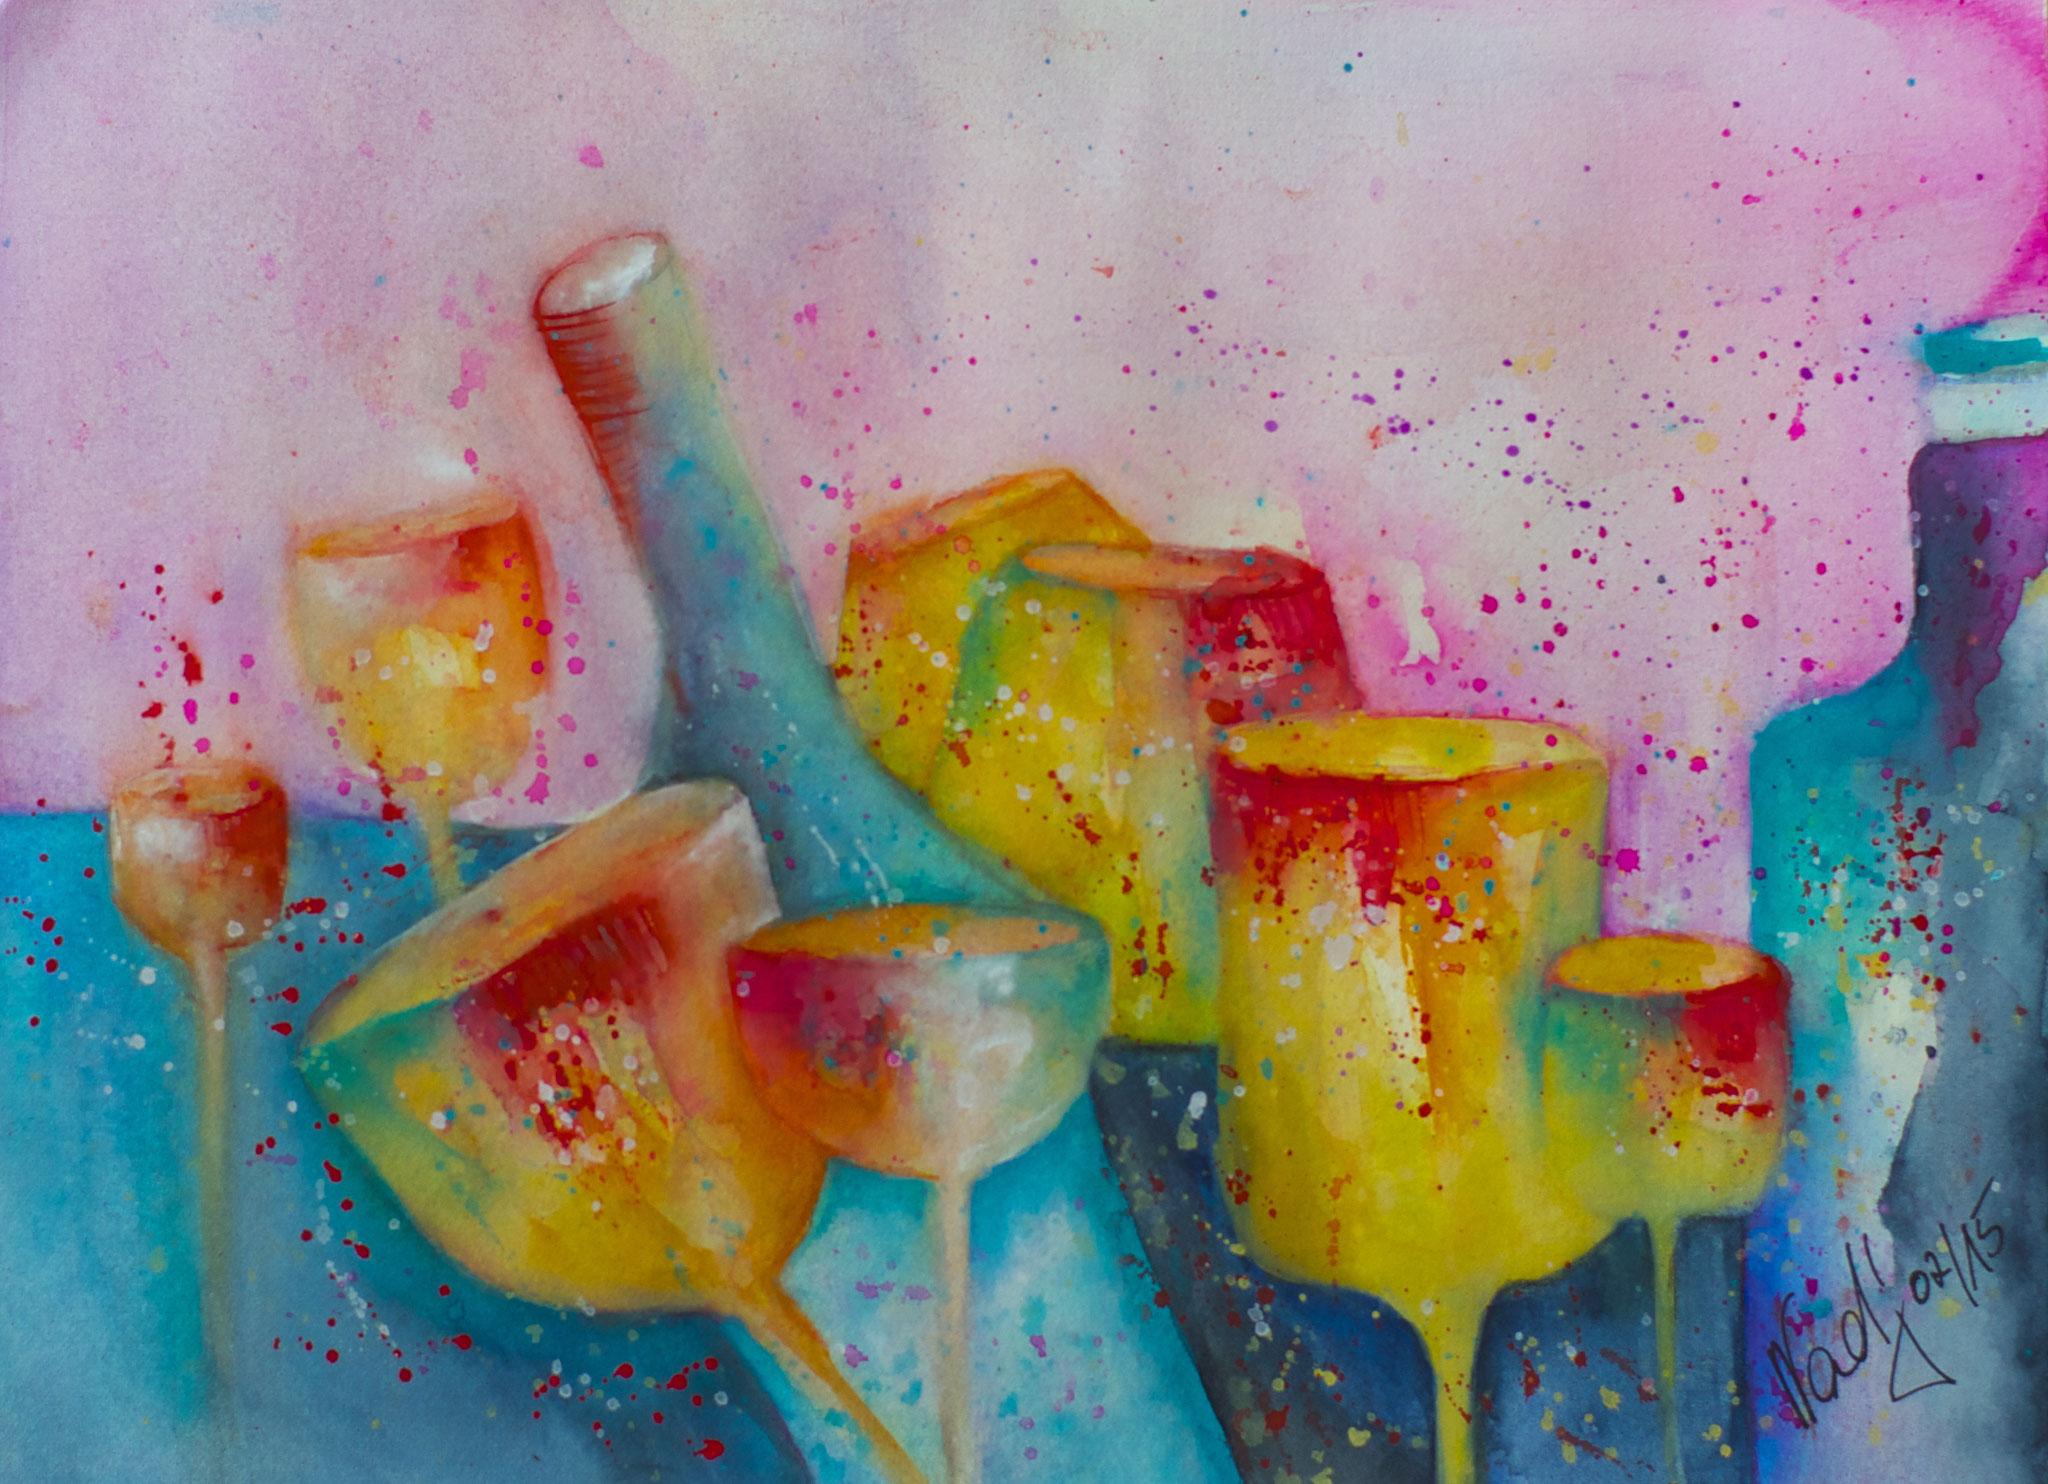 Farbenspiel Aquarell 23X30,5cm Bild Nr.65 Preis auf Anfrage